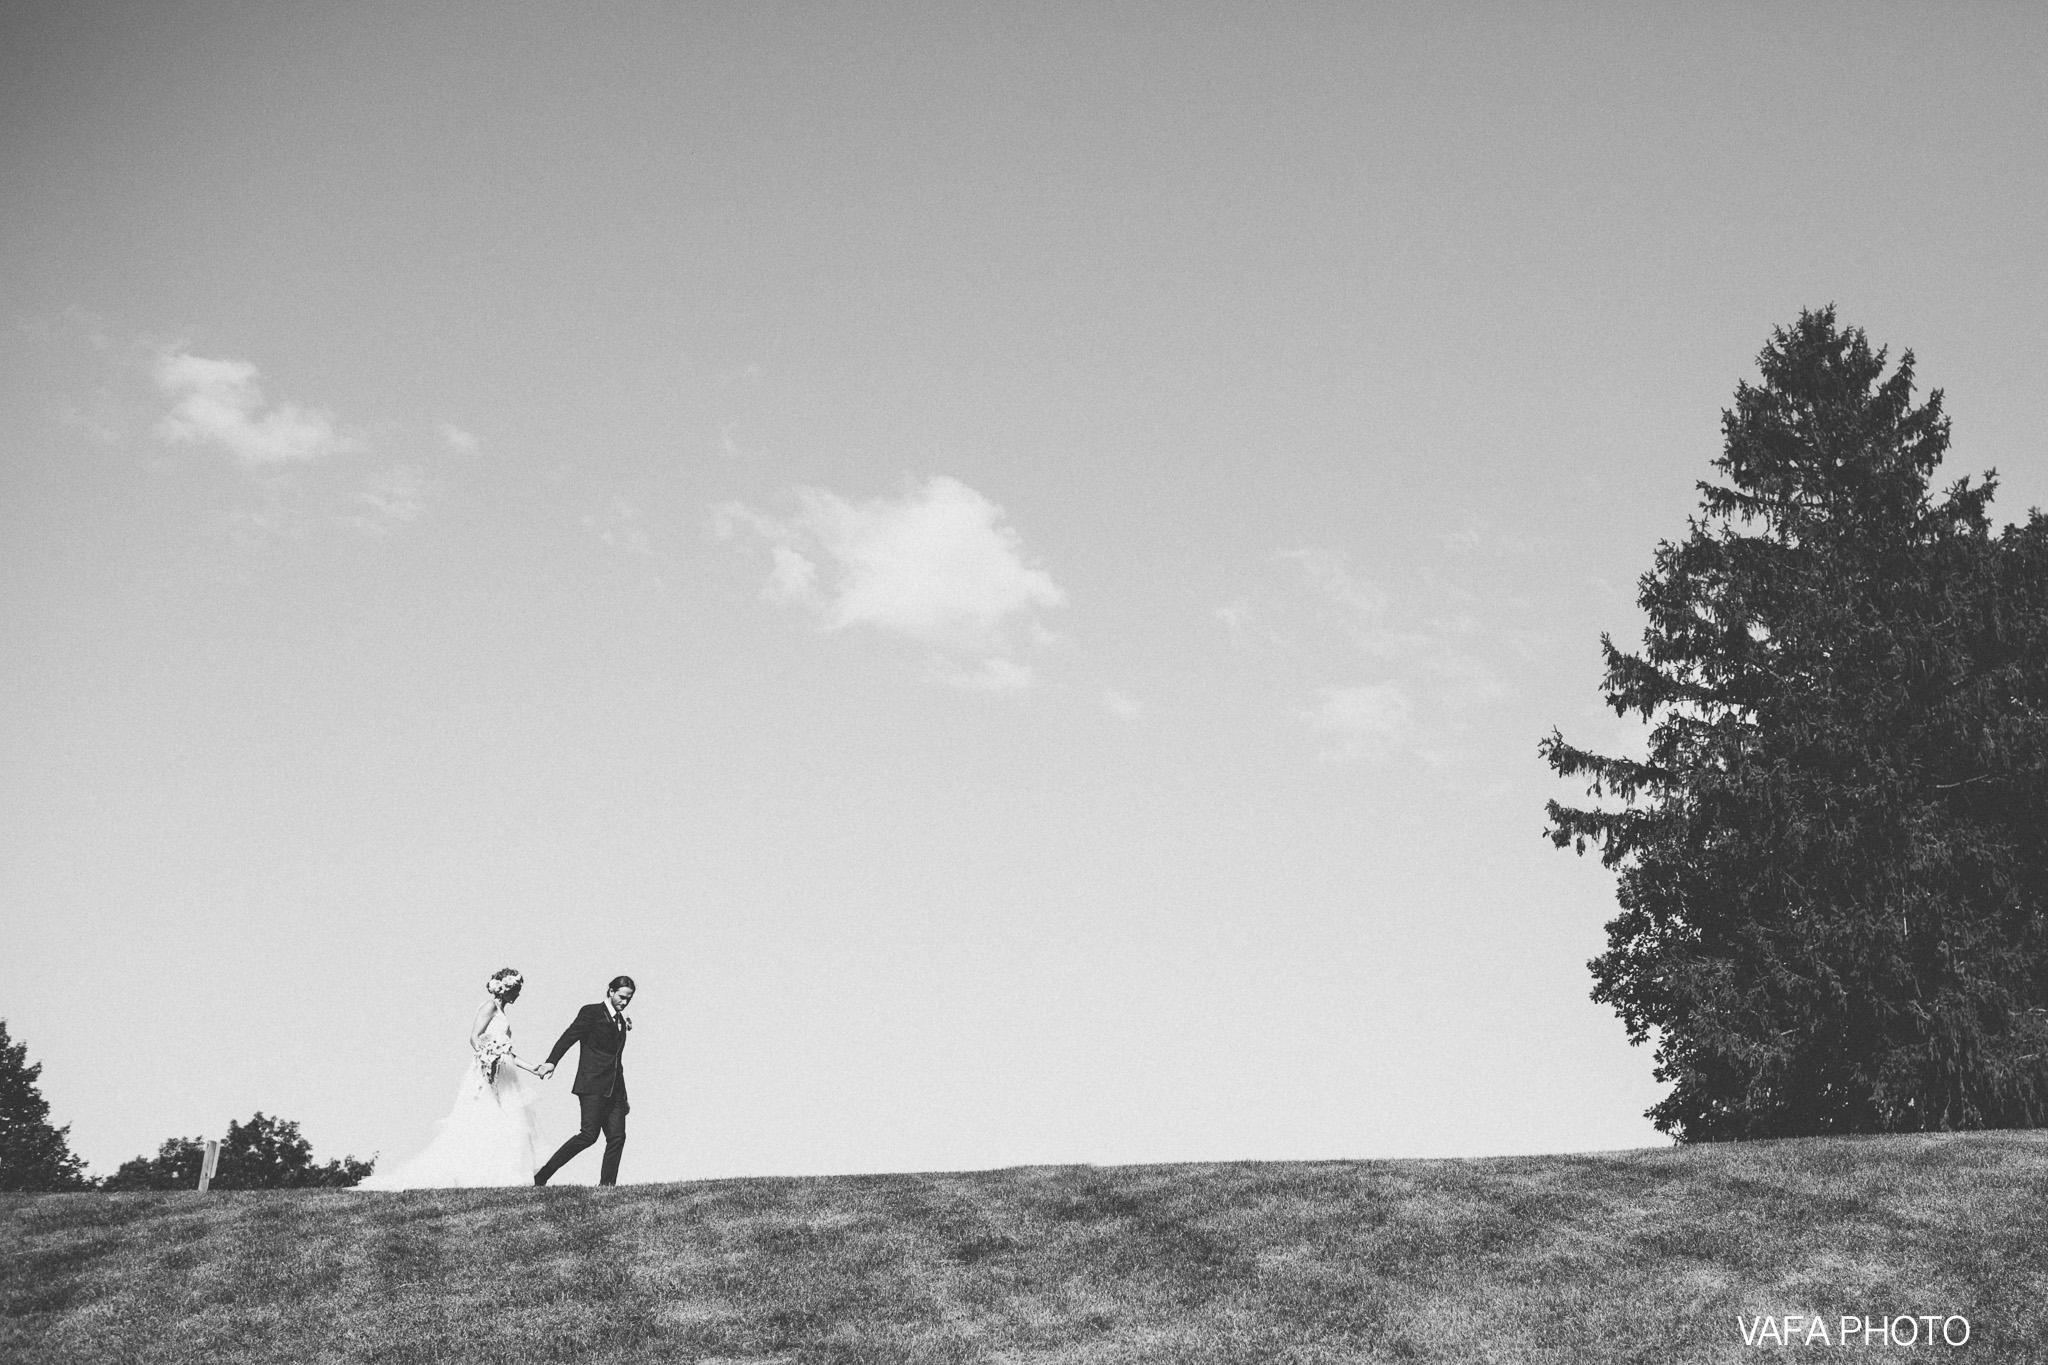 The-Felt-Estate-Wedding-Kailie-David-Vafa-Photo-594.jpg